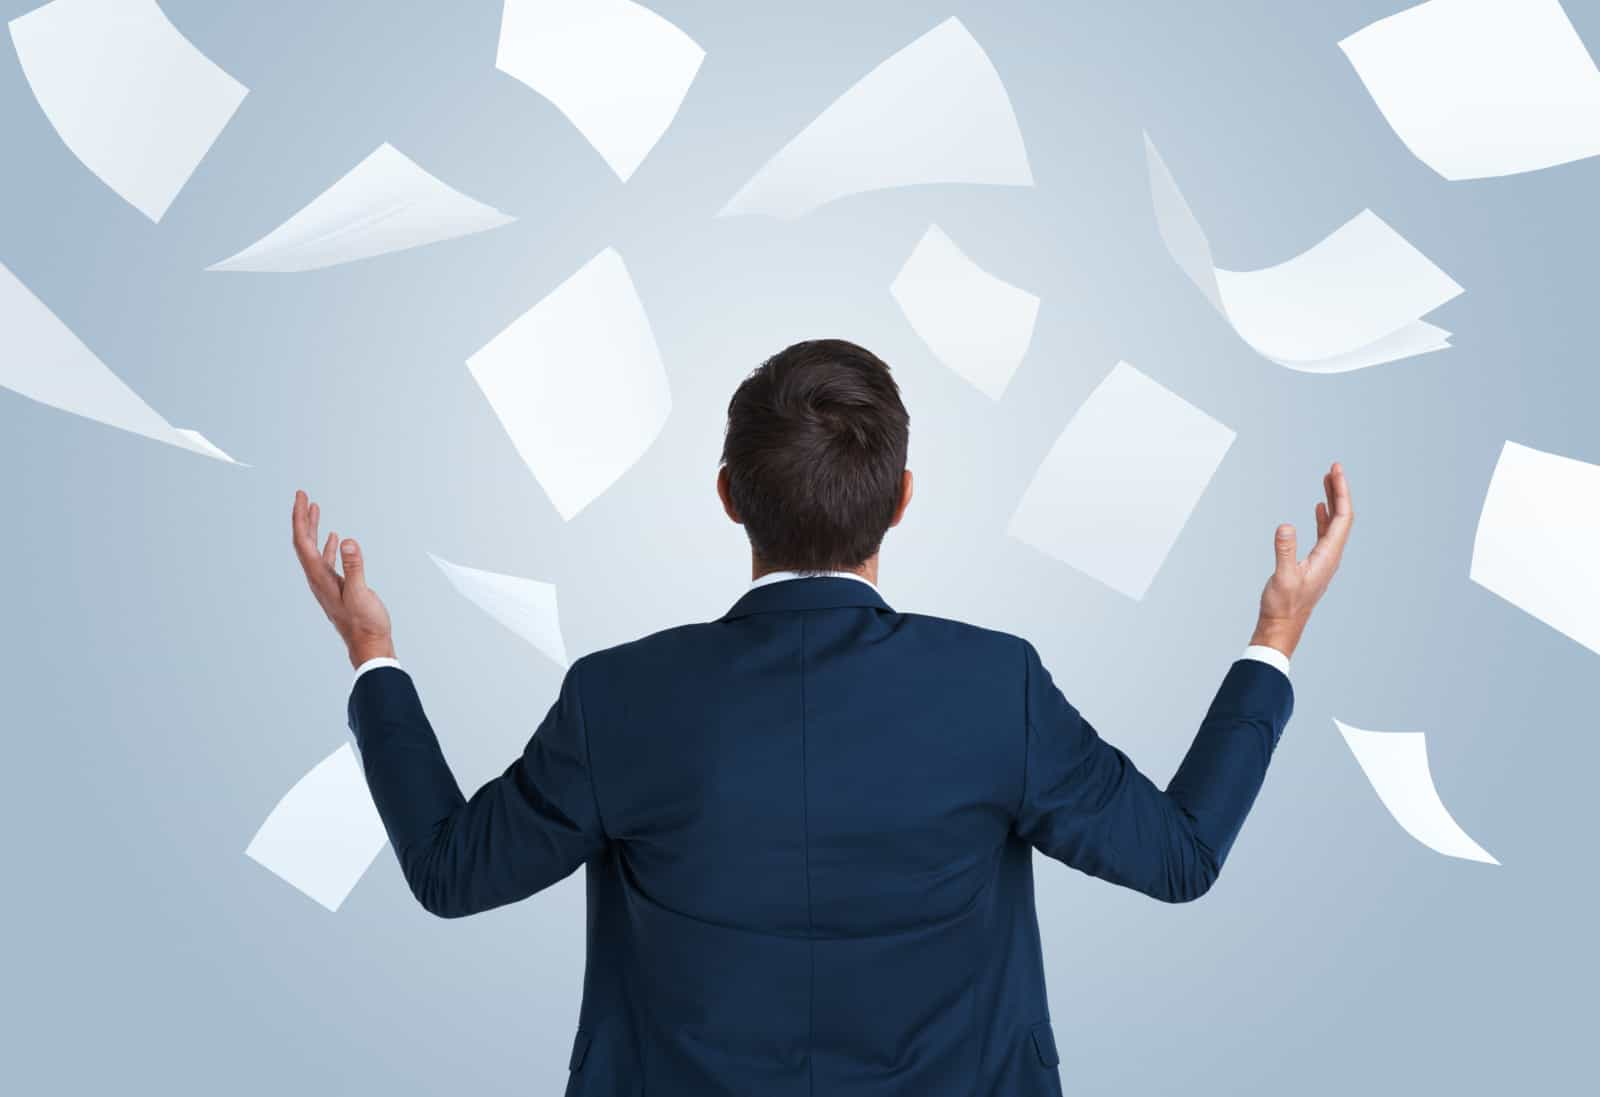 cbt for stress management pdf